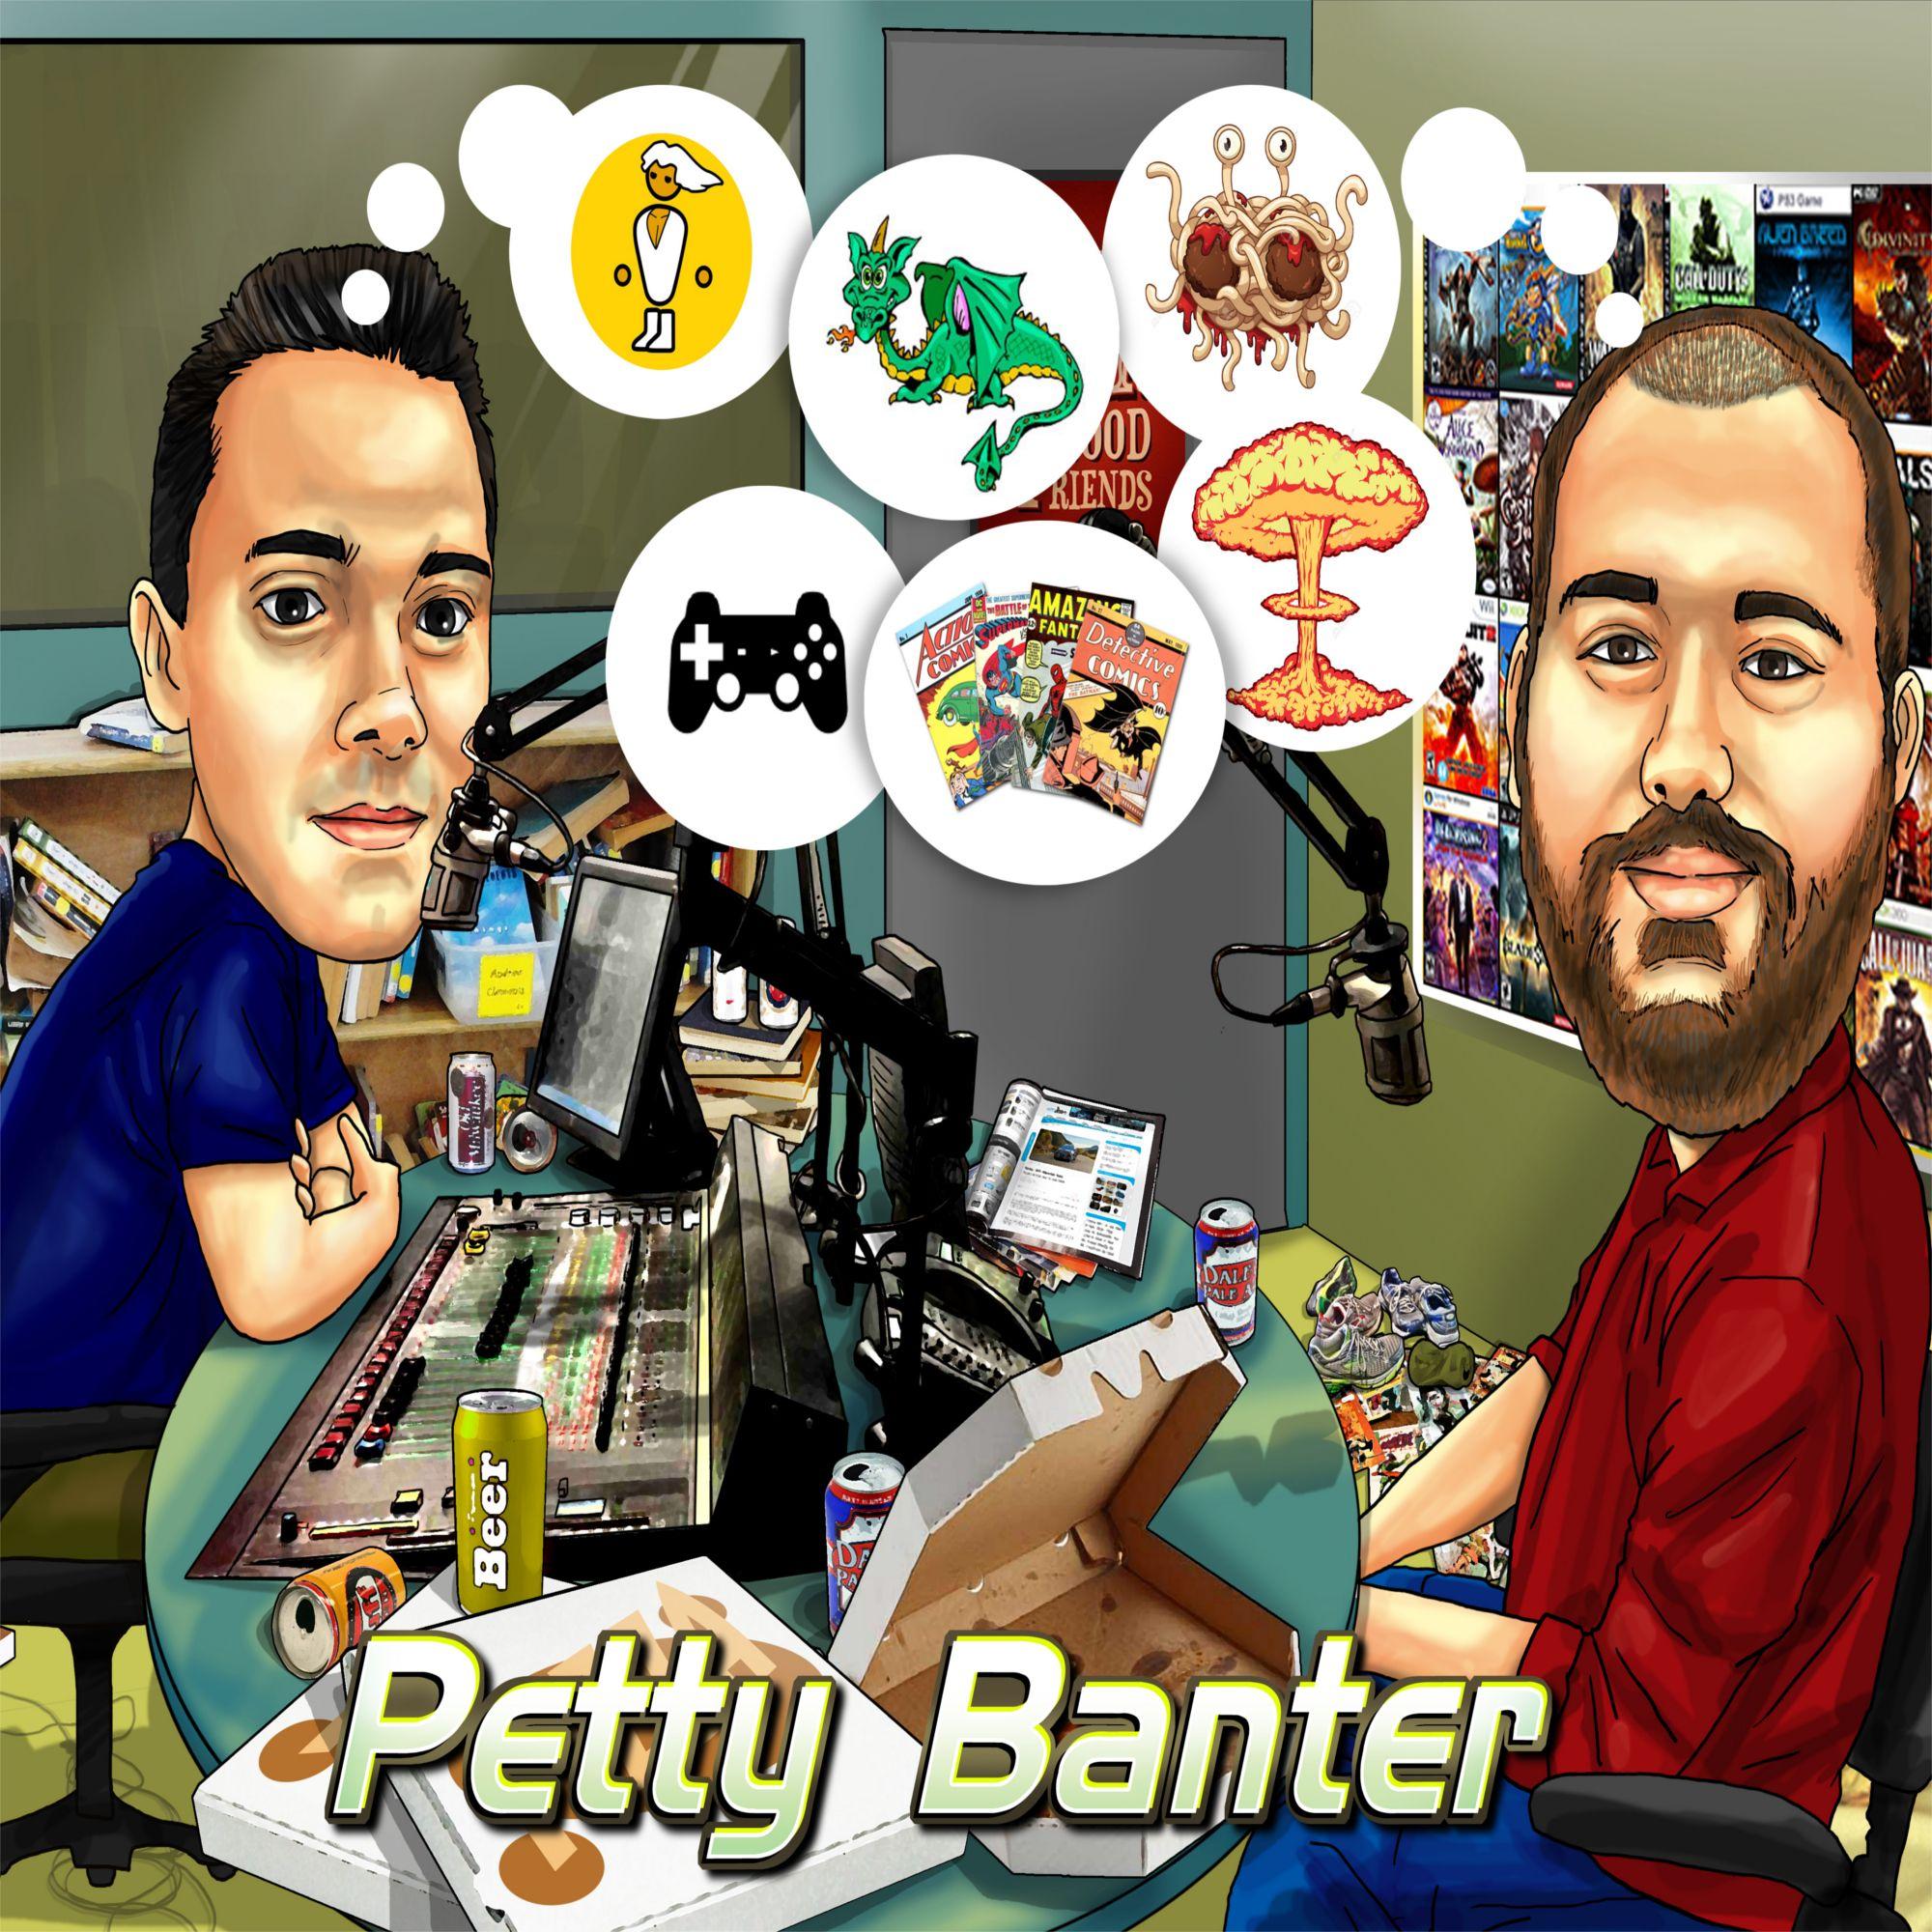 Petty Banter